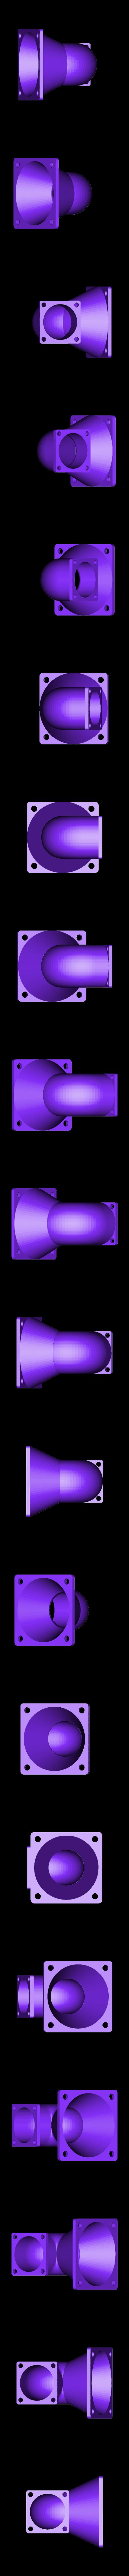 Wanhao_50mm_to_30mm_Fan_Adapter_Fixed.stl Download free STL file Wanhao & Tevo Tarantula 30mm Fan to 50mm Fan Adapter • 3D printable design, DIY3DTech